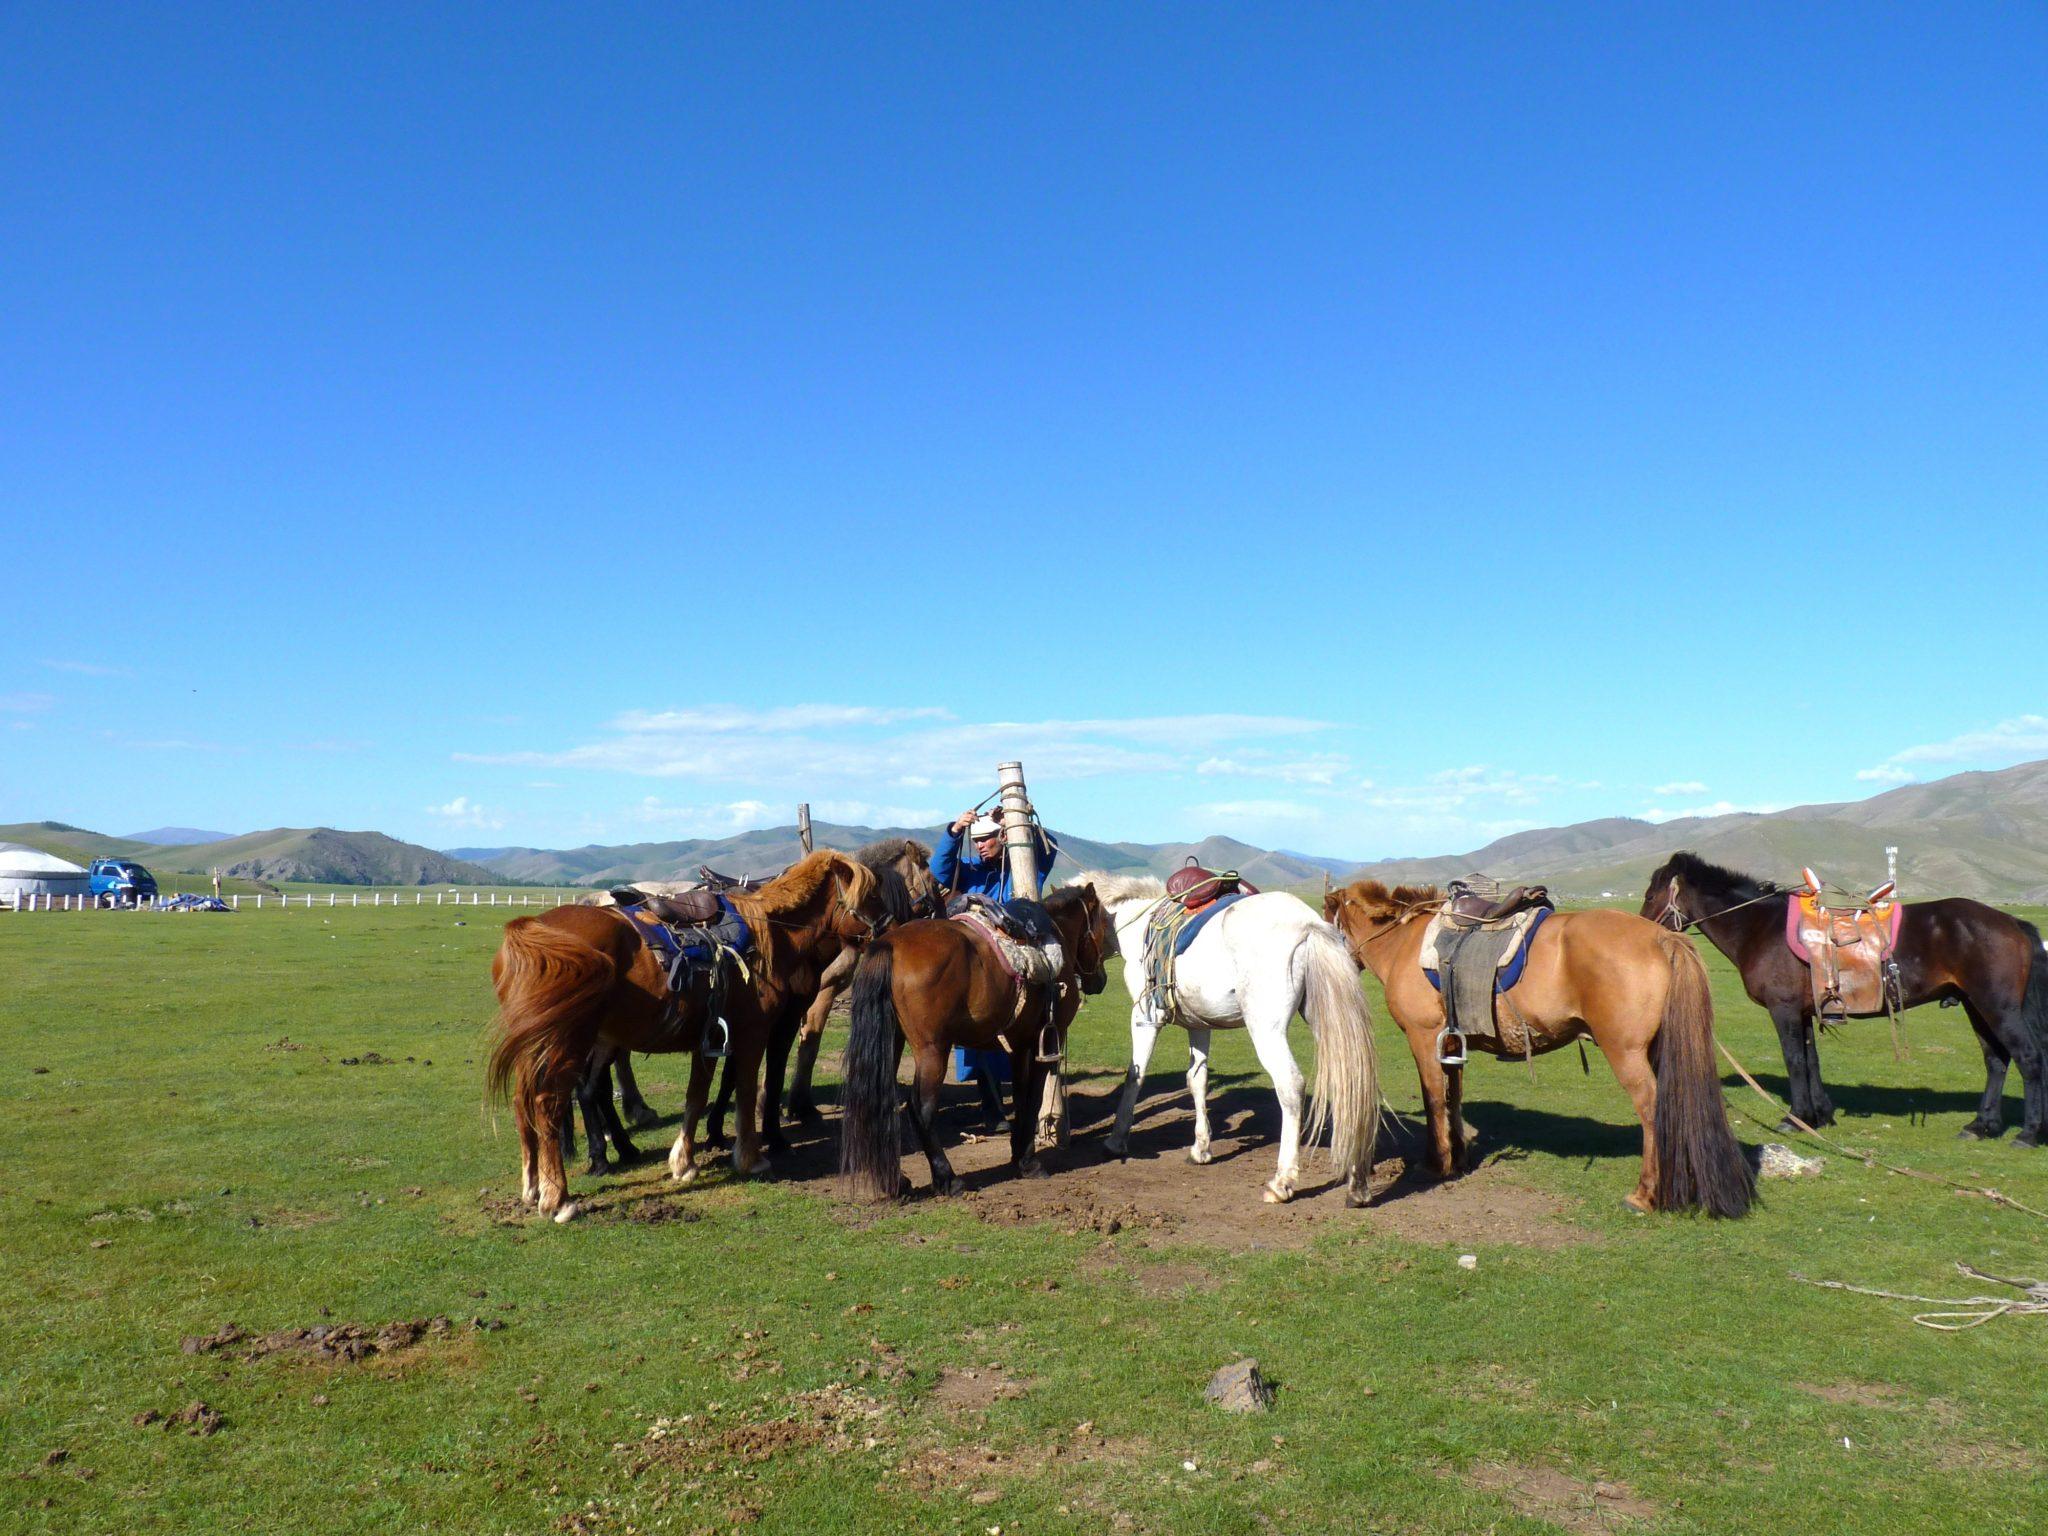 Cavalos 02 Mongólia Mundo Indefinido